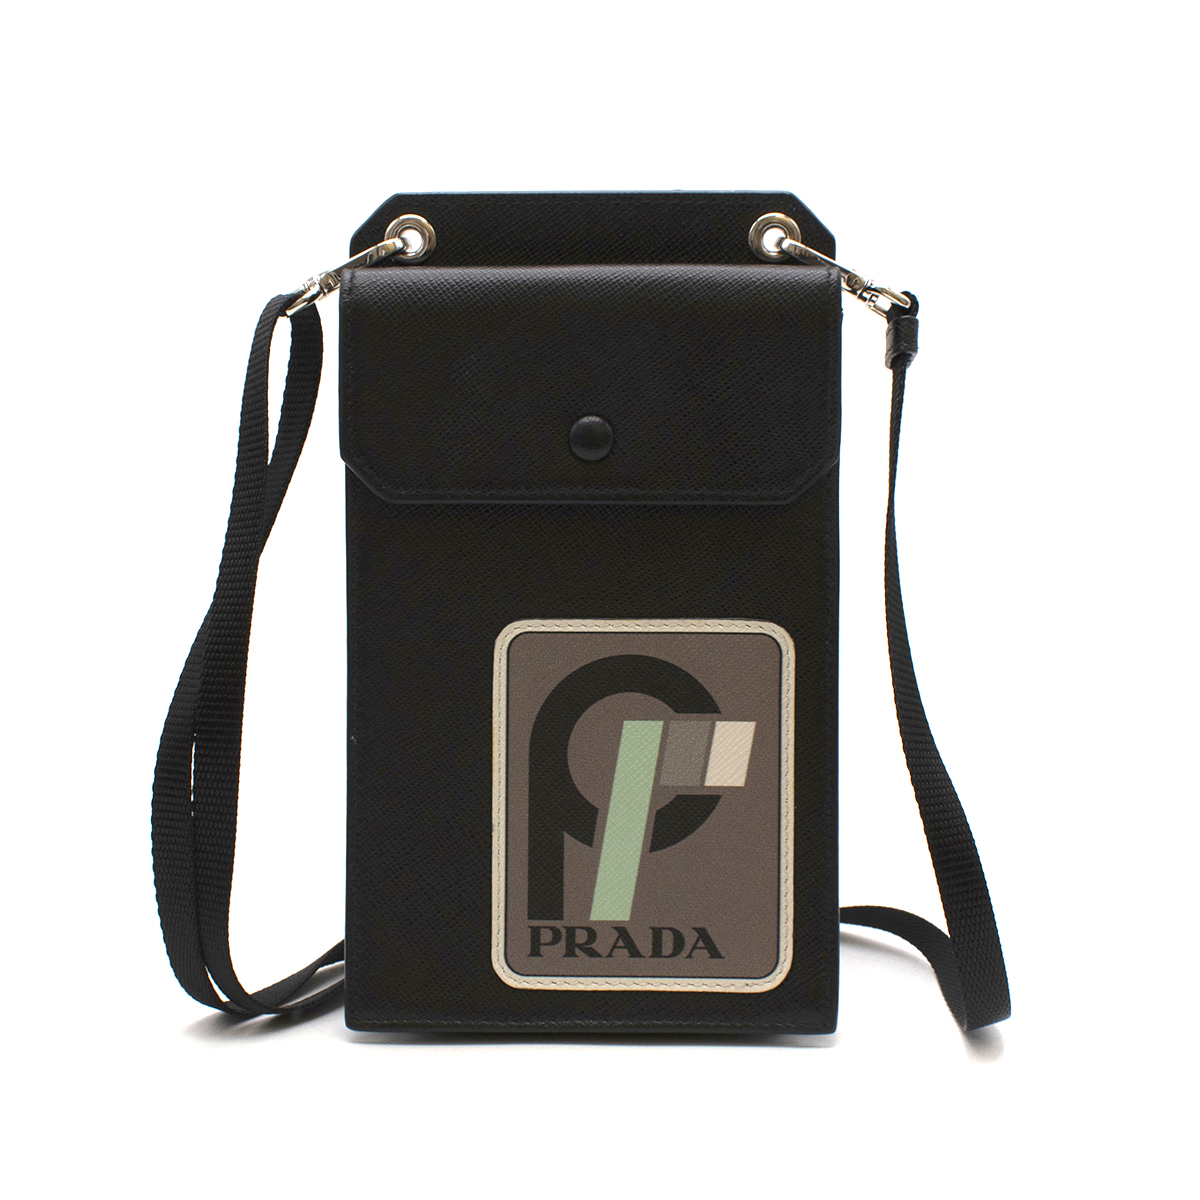 Prada Runway Black Saffiano Leather Smartphone Case